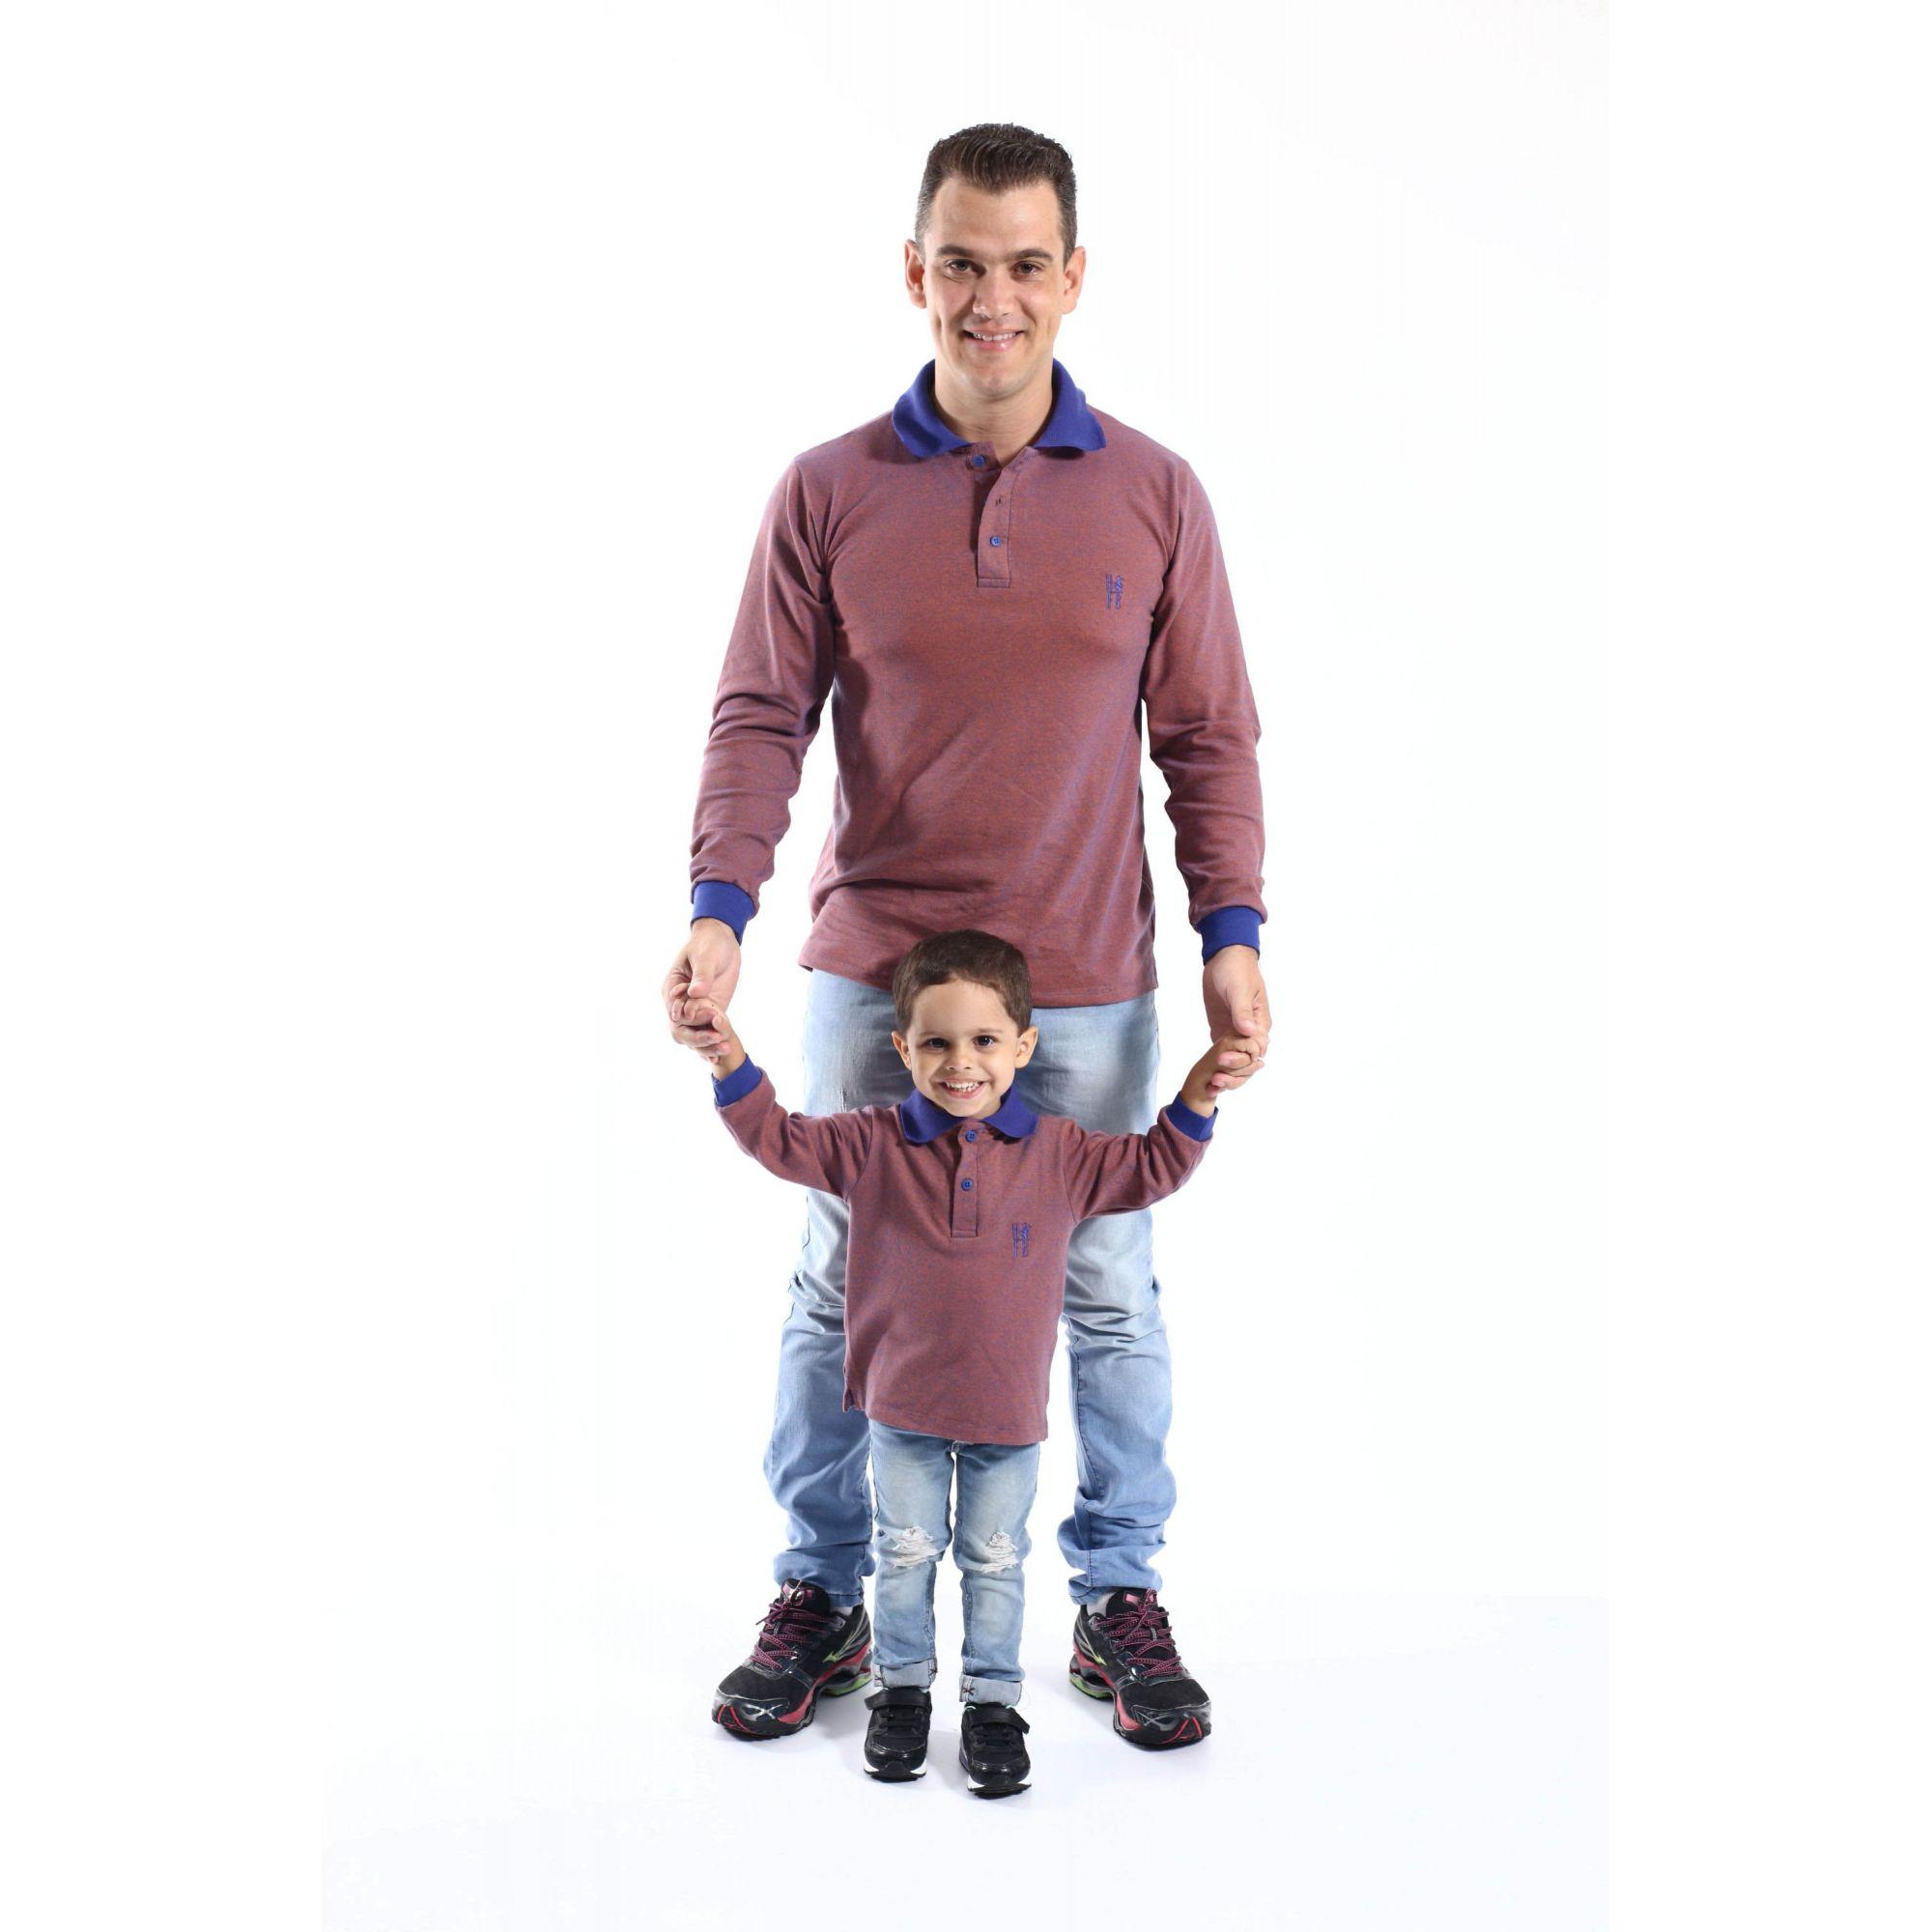 PAI E FILHO > Kit 02 Camisas Polos laranjas Manga Longa [Coleção Tal Pai Tal Filho]